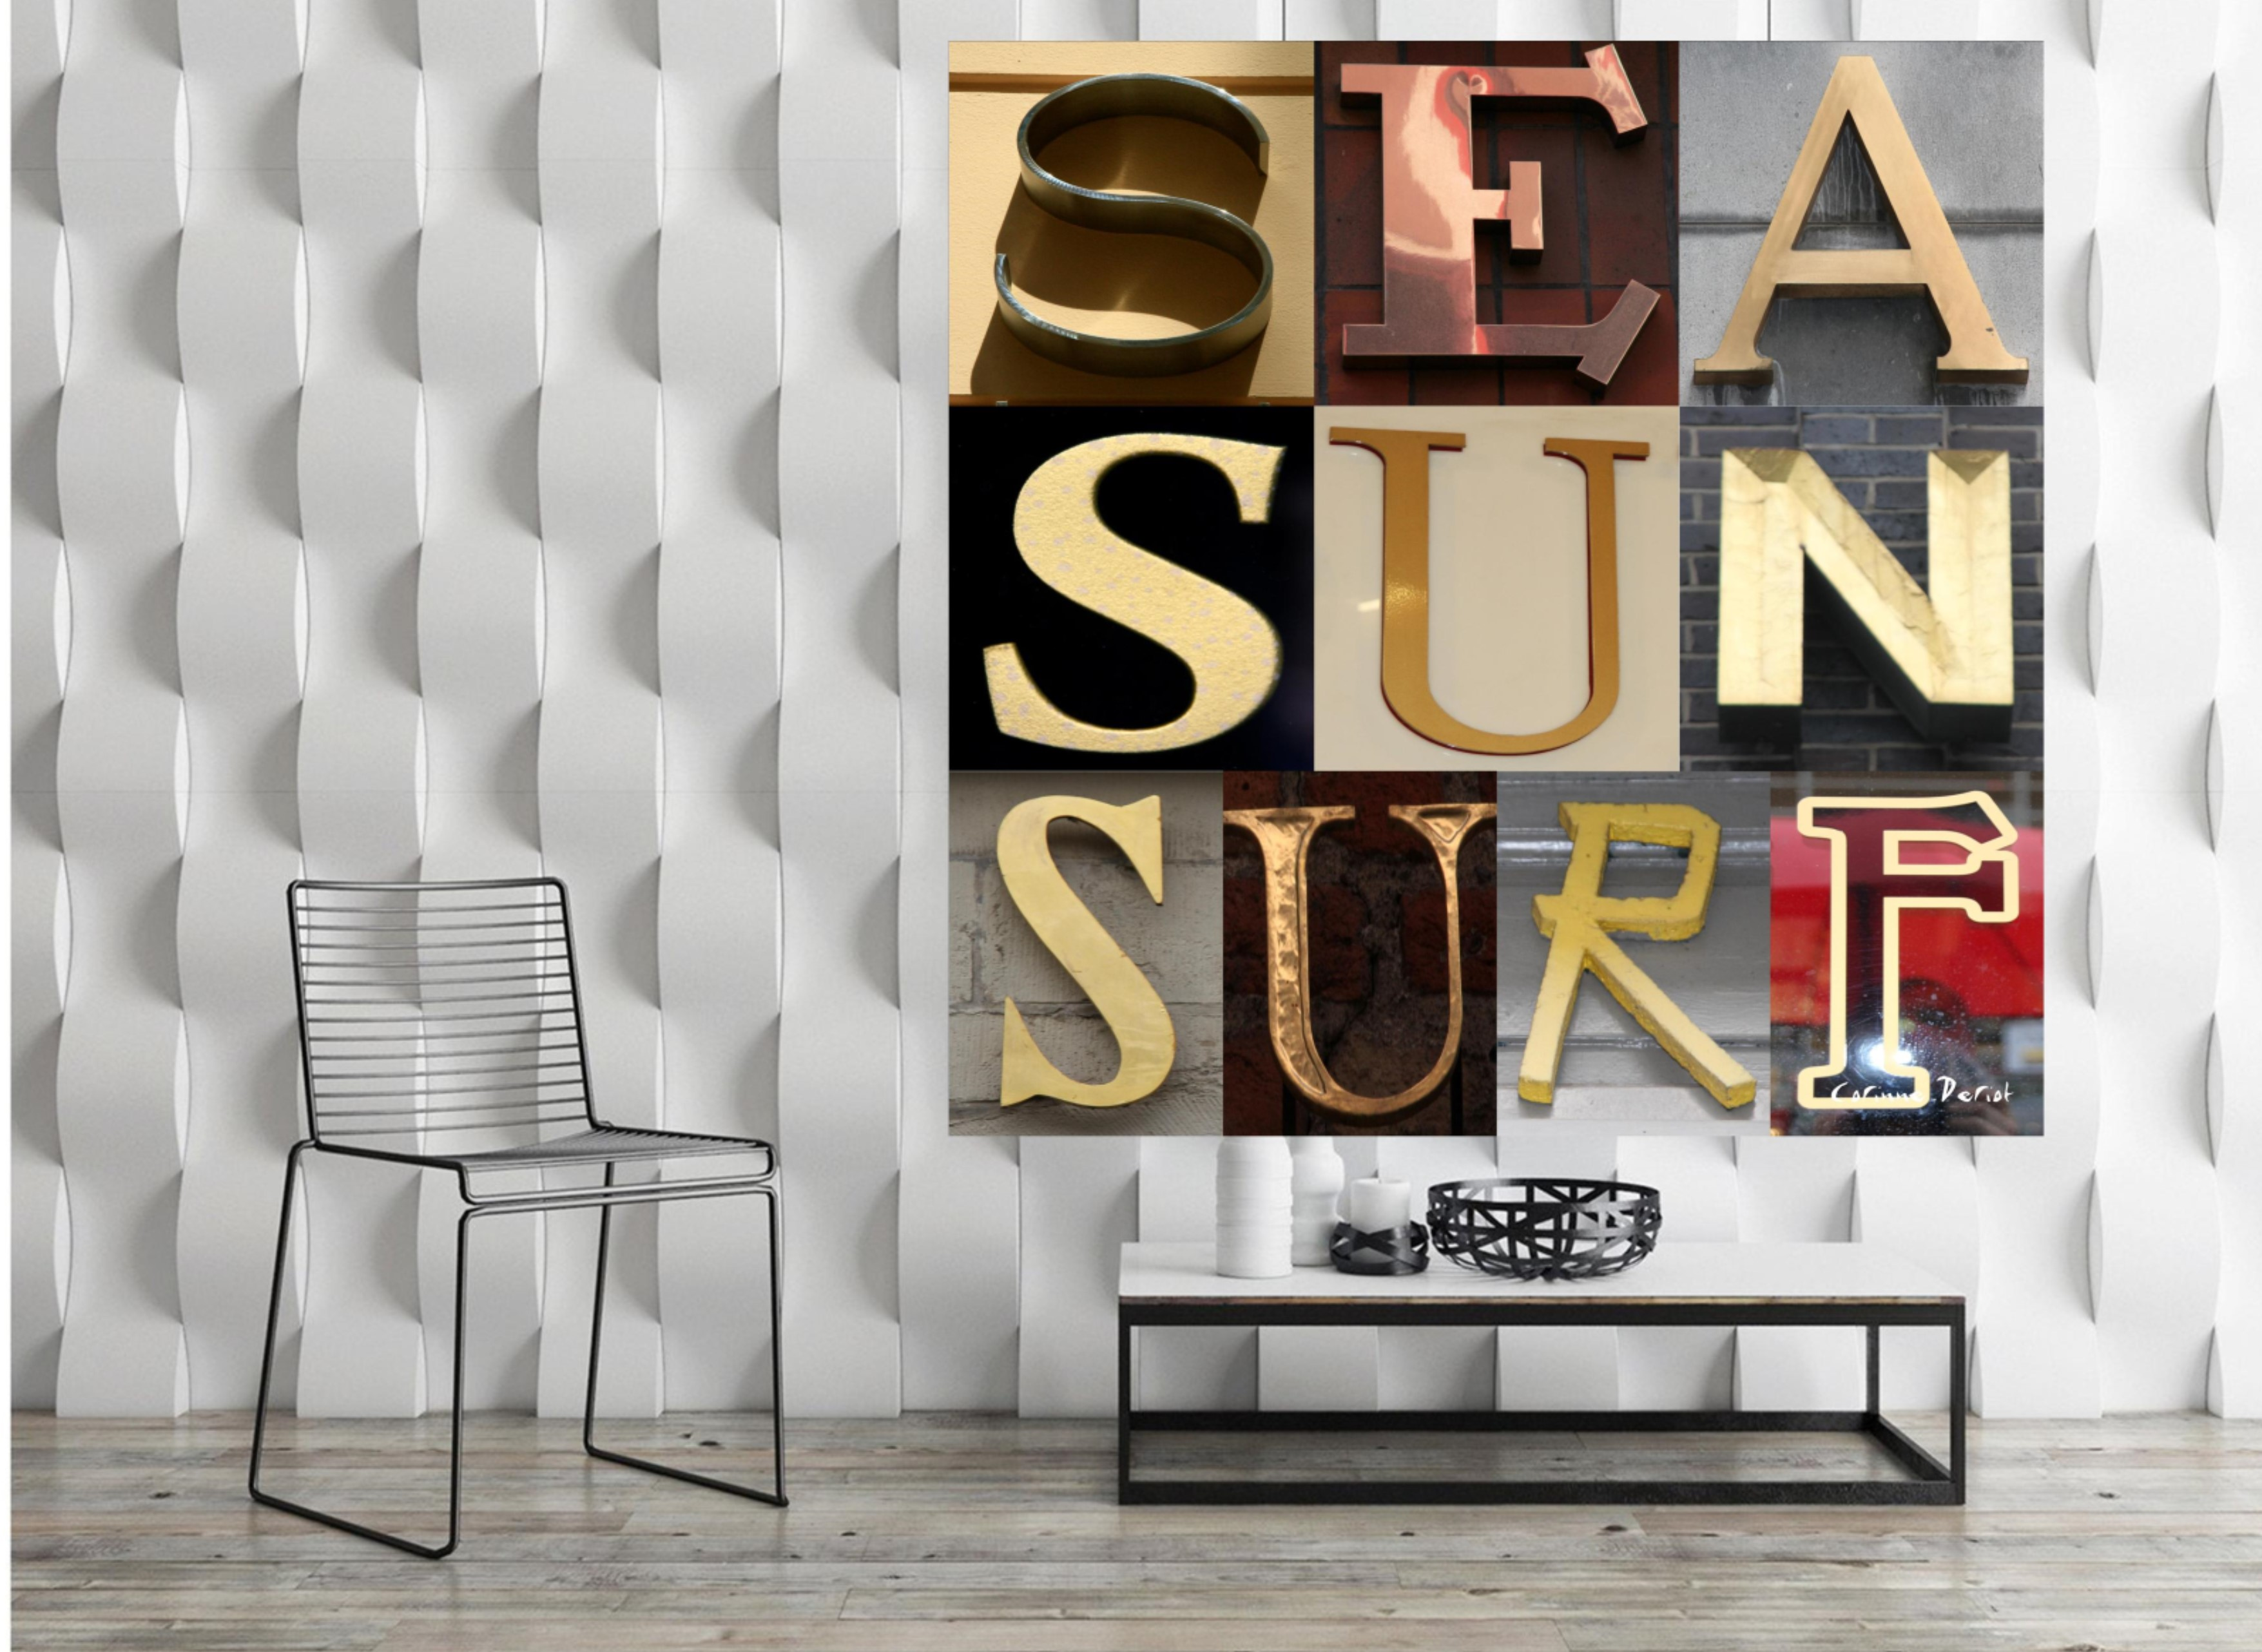 SEA SUN SURF 01